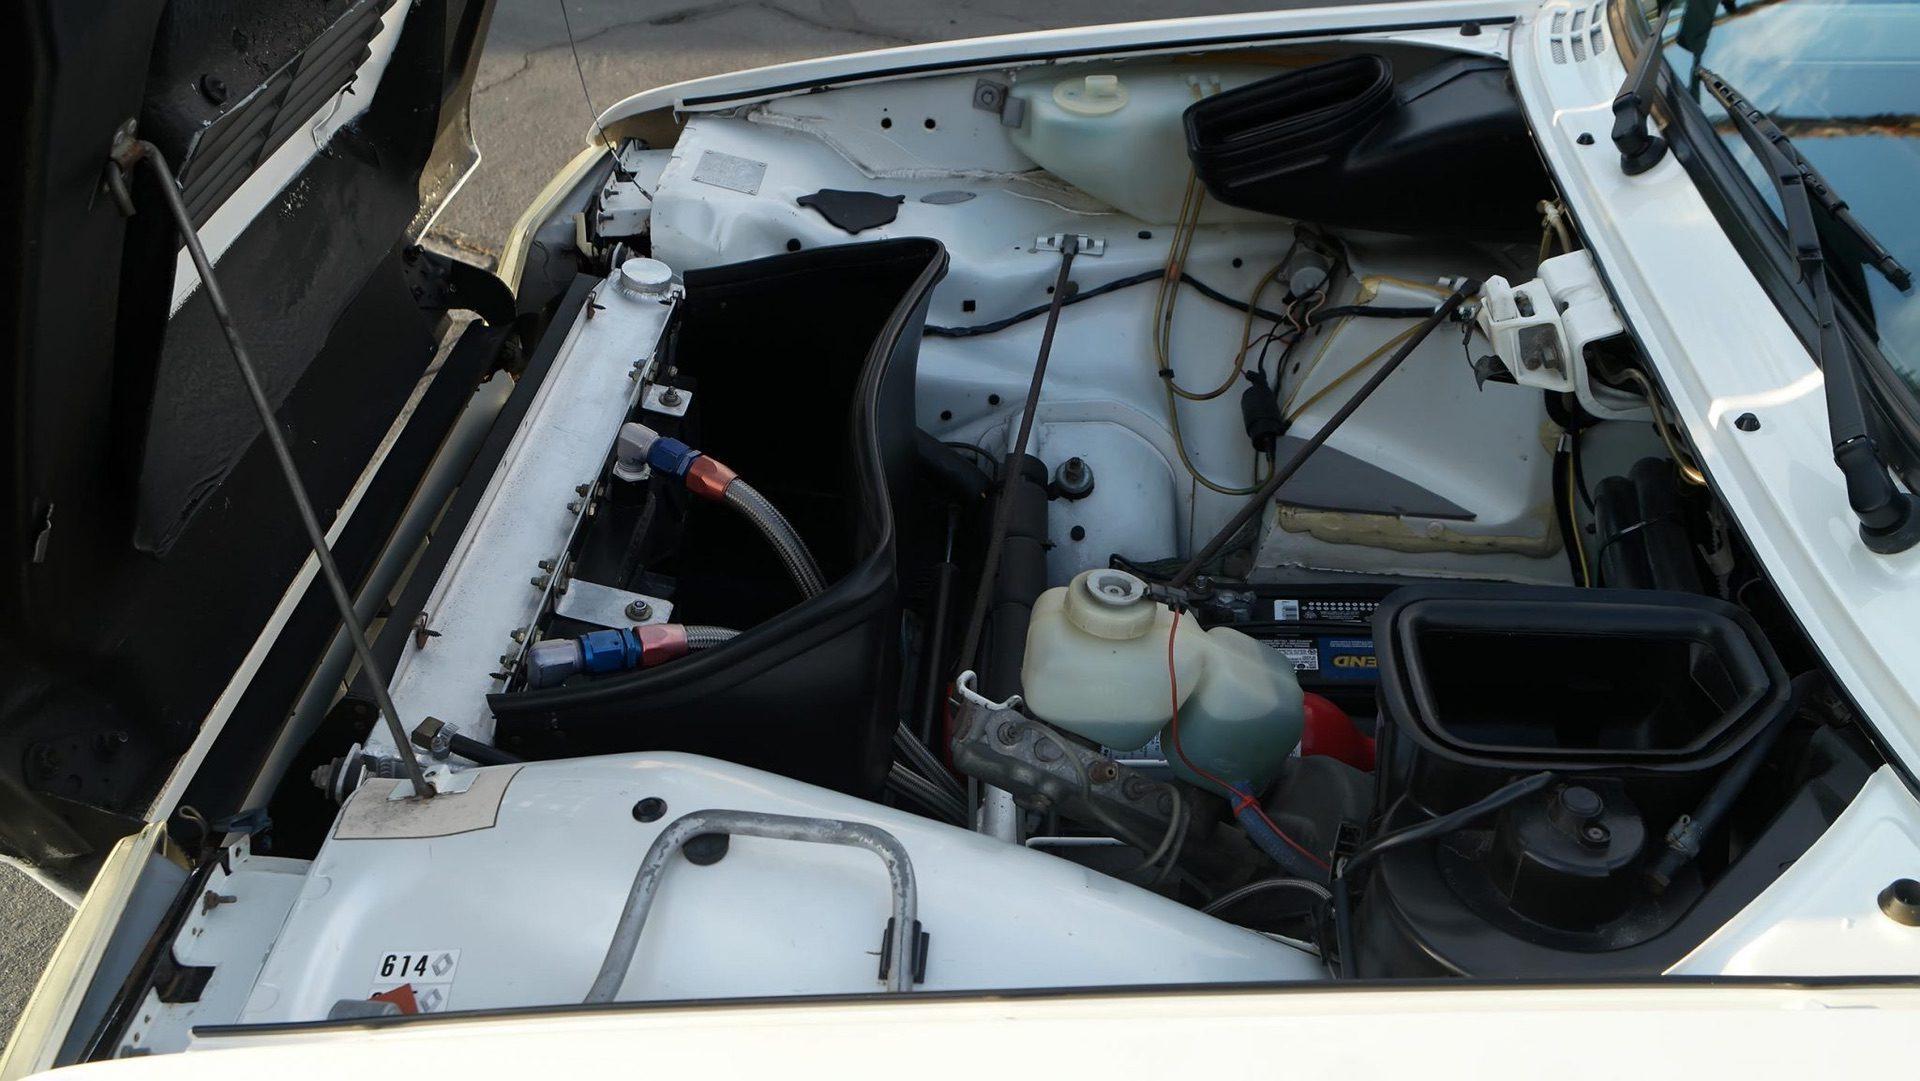 1985_Renault_R5_Turbo_2_rotary-0014